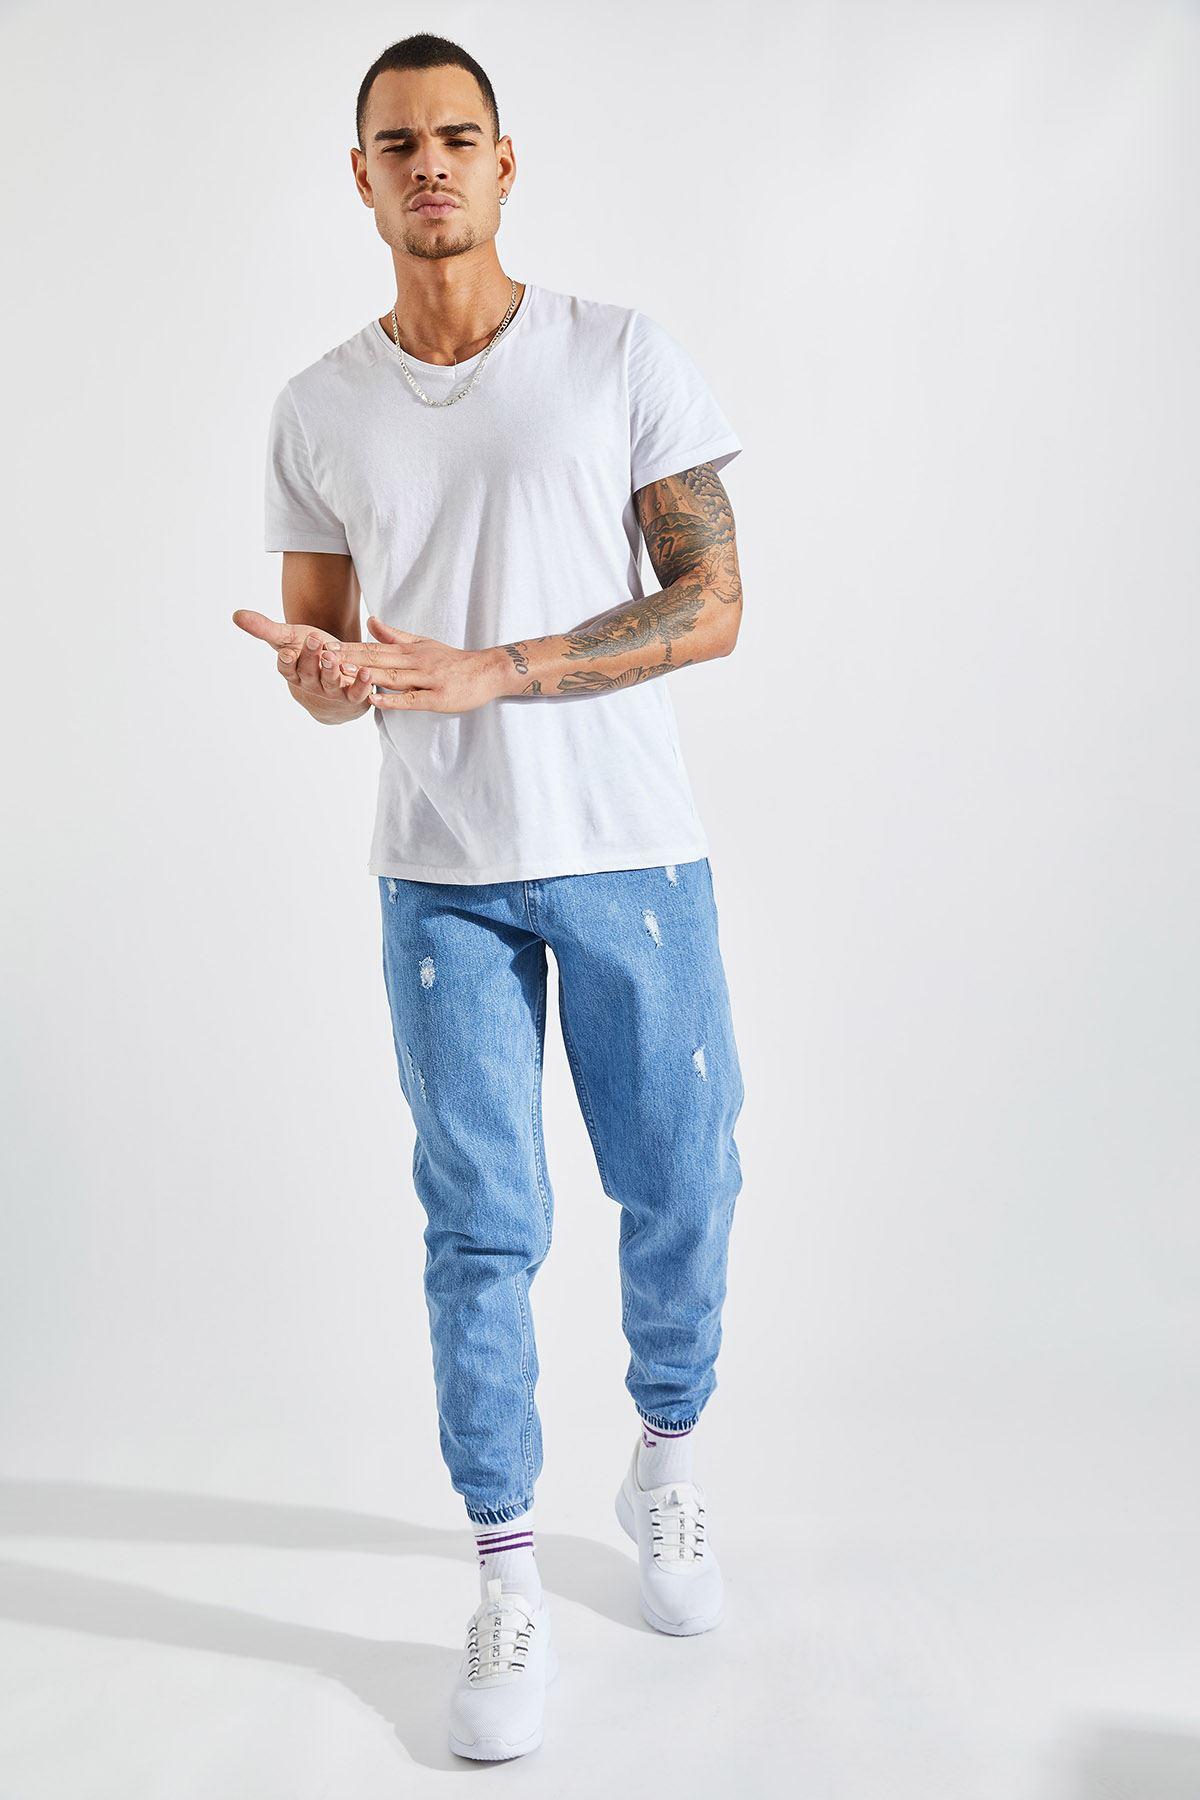 Erkek Boyfriend Paça Lastikli Lazer Tırnaklı Açık Mavi Pantolon